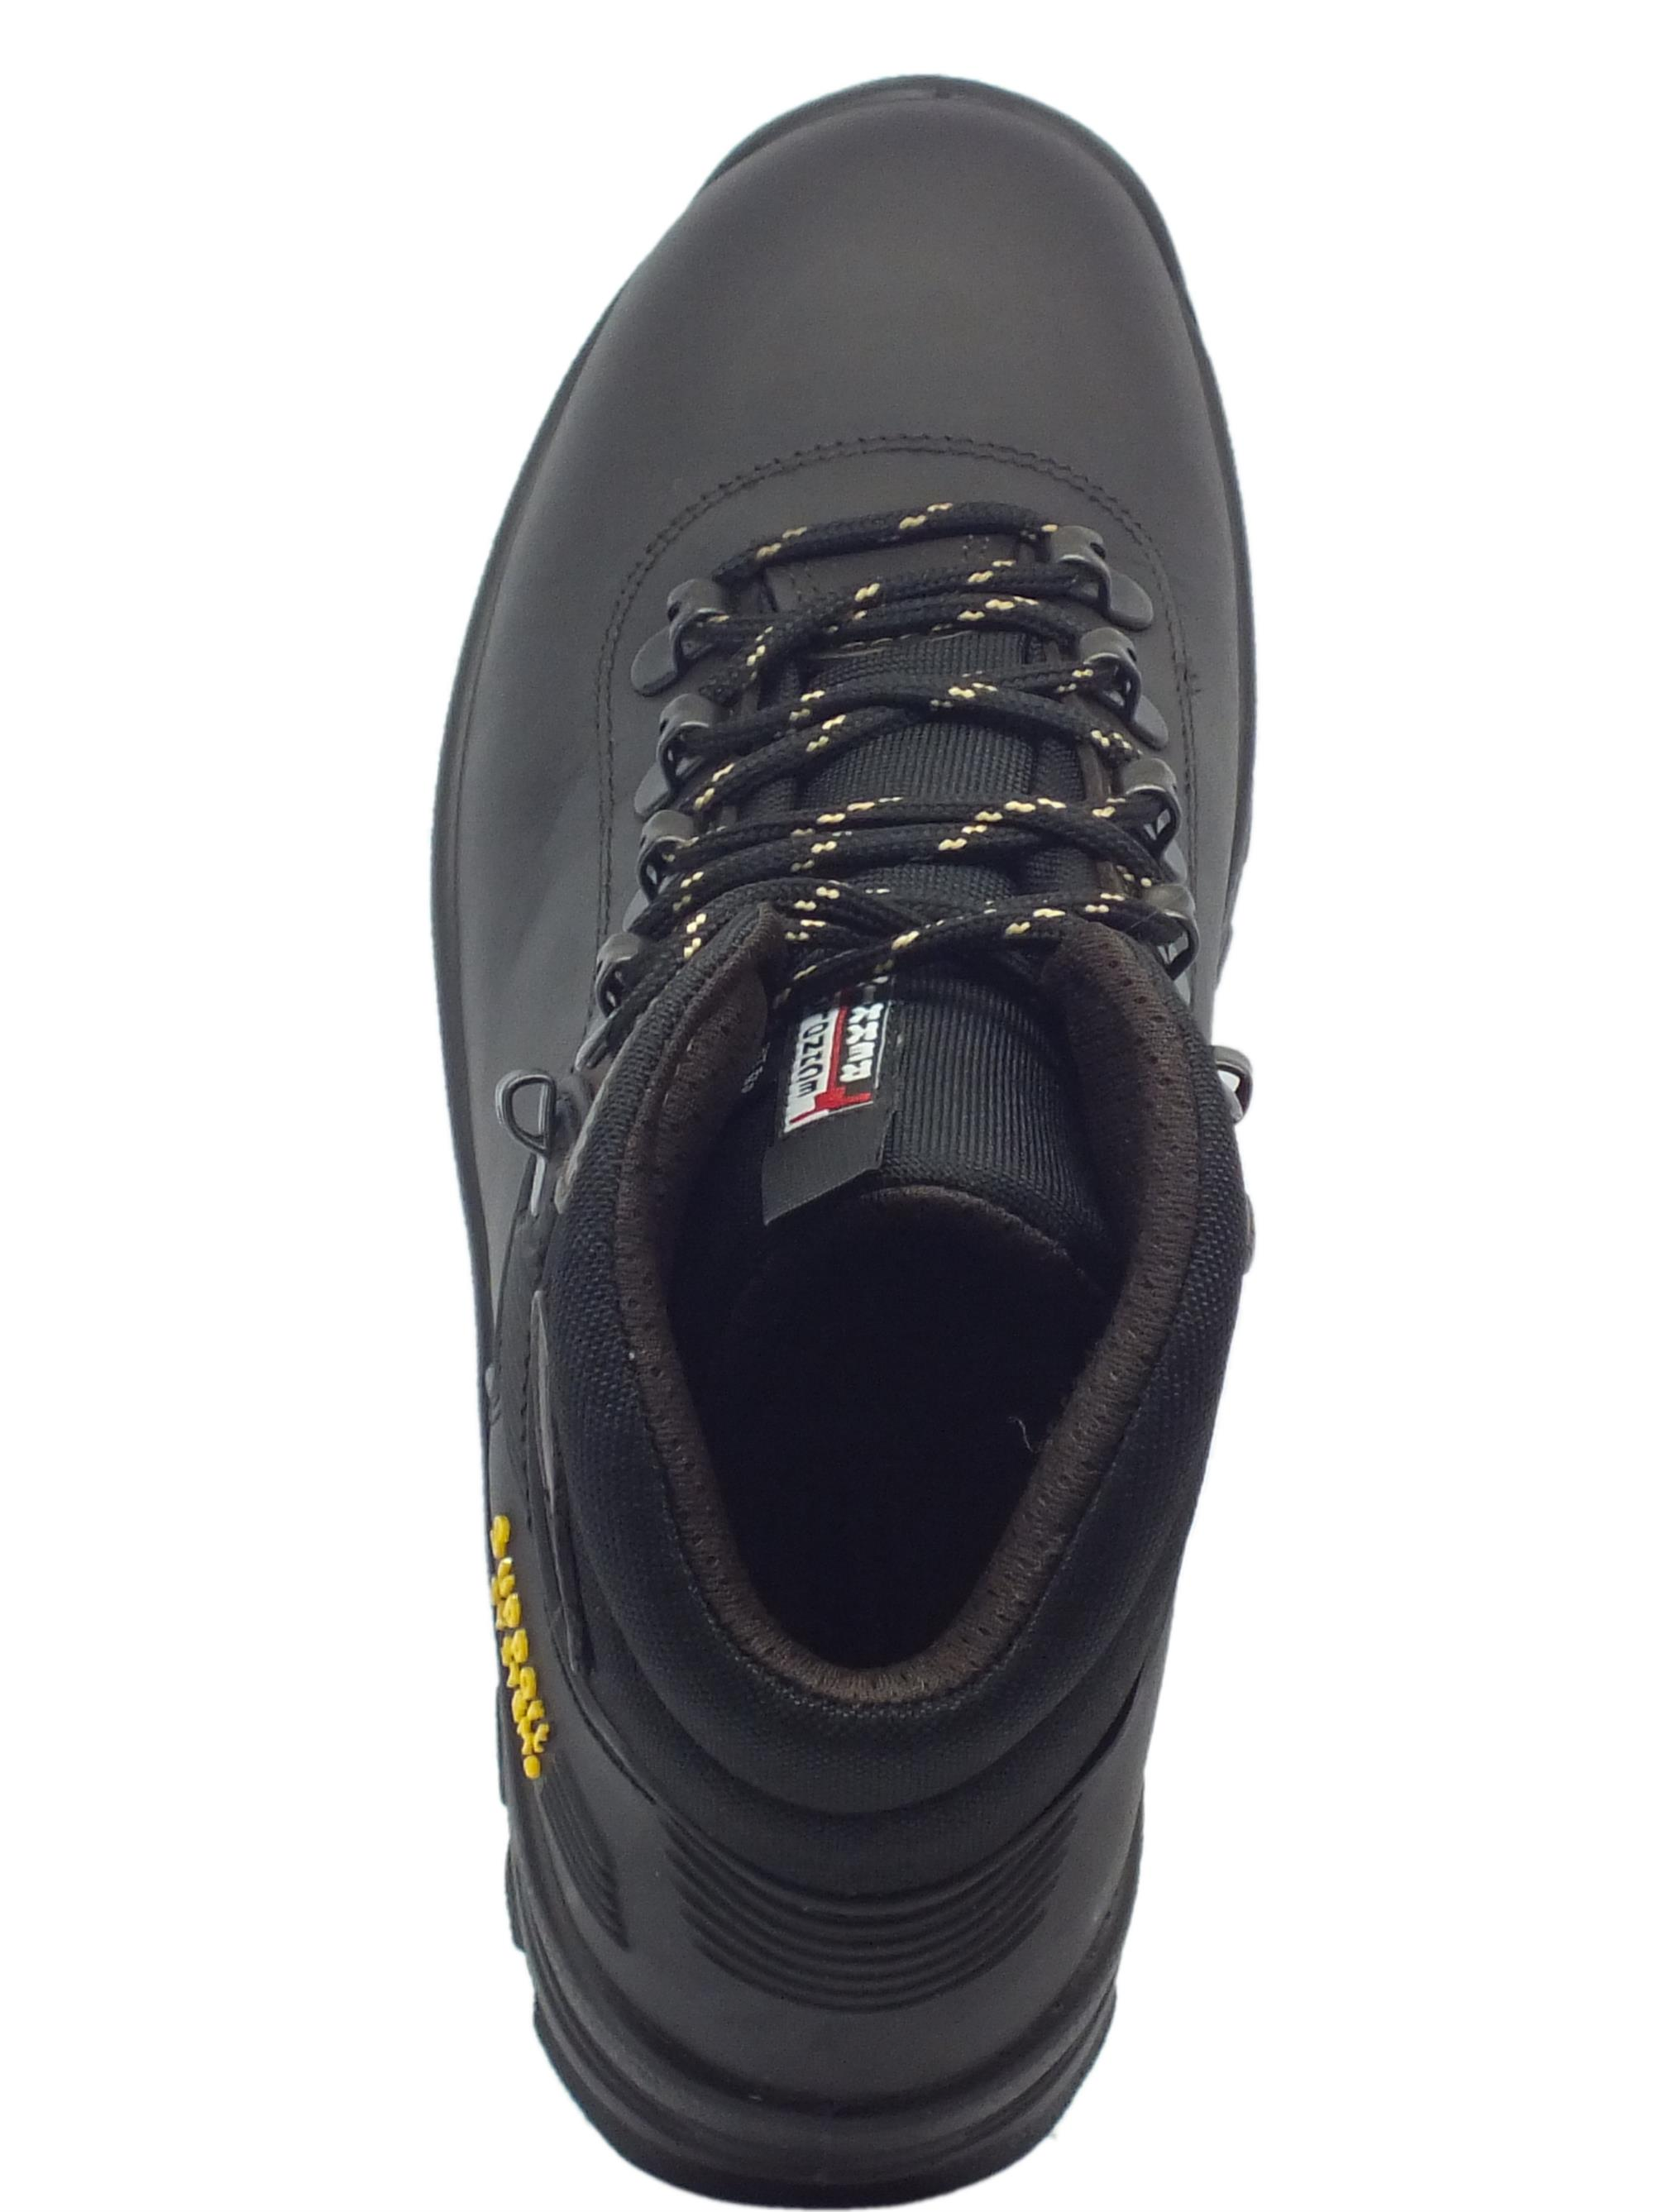 Scarponcini da trekking uomo Grisport pelle nera - Vitiello Calzature 8344130bca3